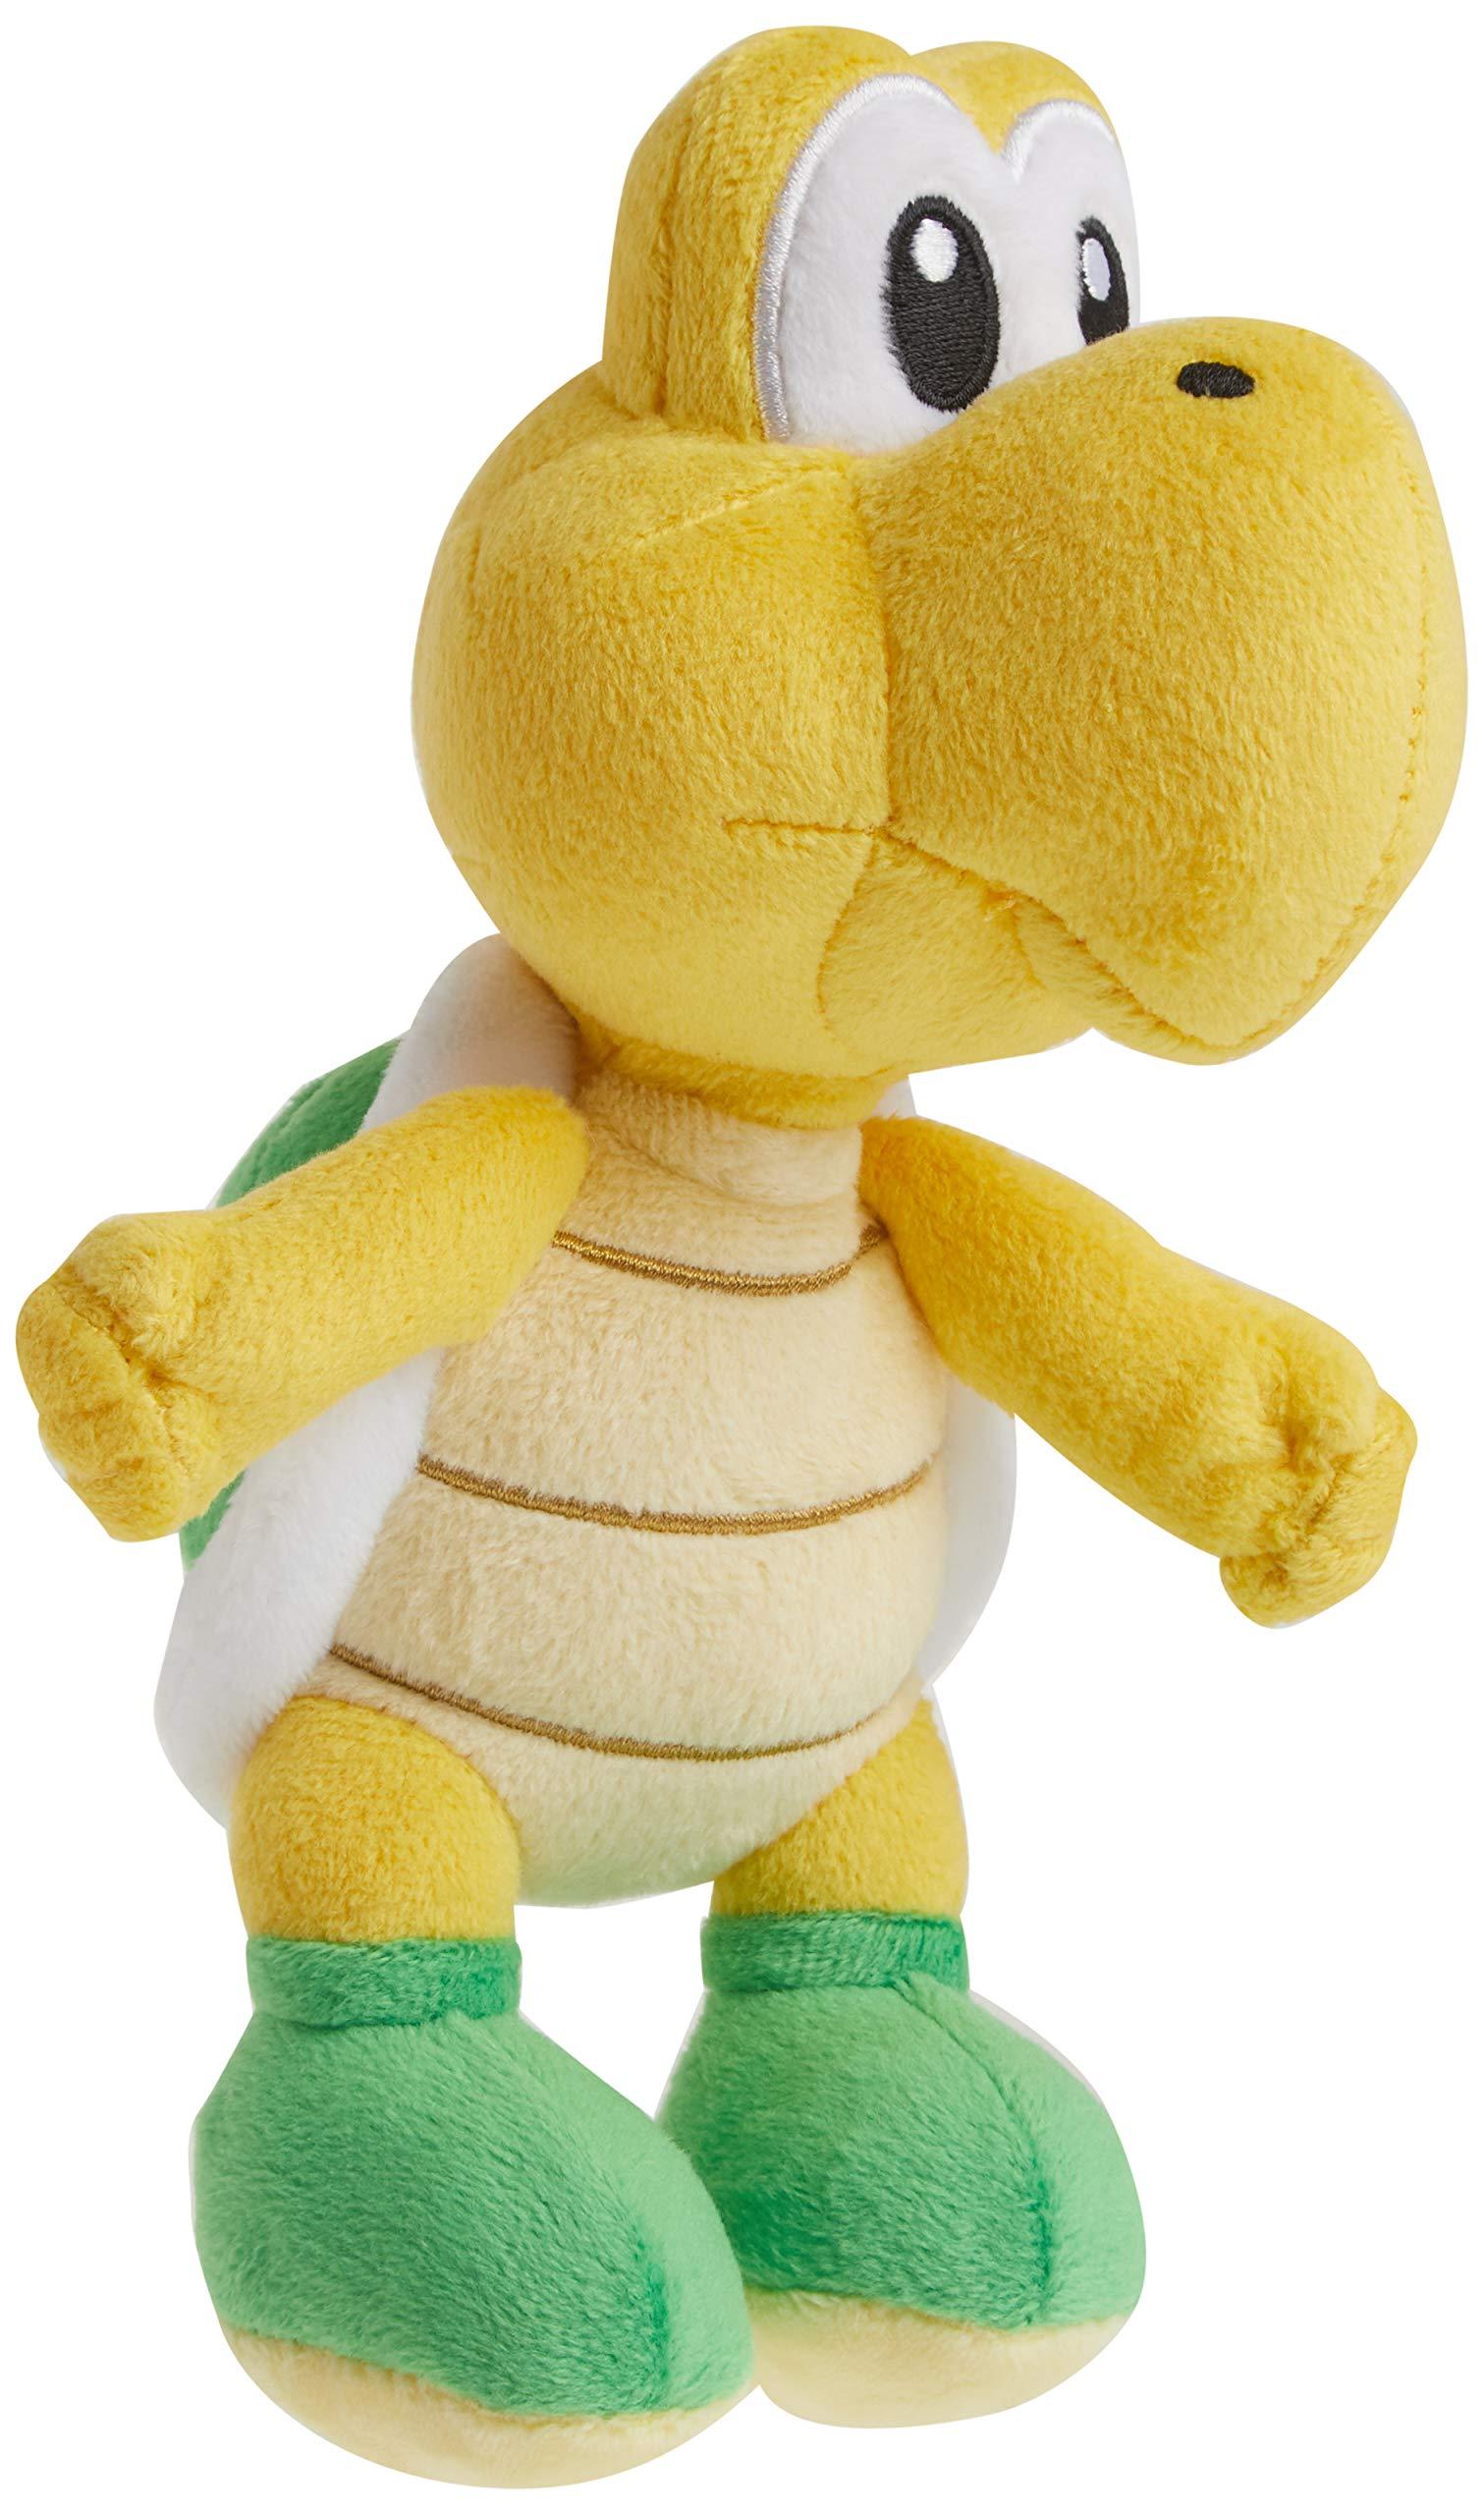 "Little Buddy Super Mario All Star Collection 1425 Koopa Troopa Stuffed Plush, 7"",Multi-Colored"